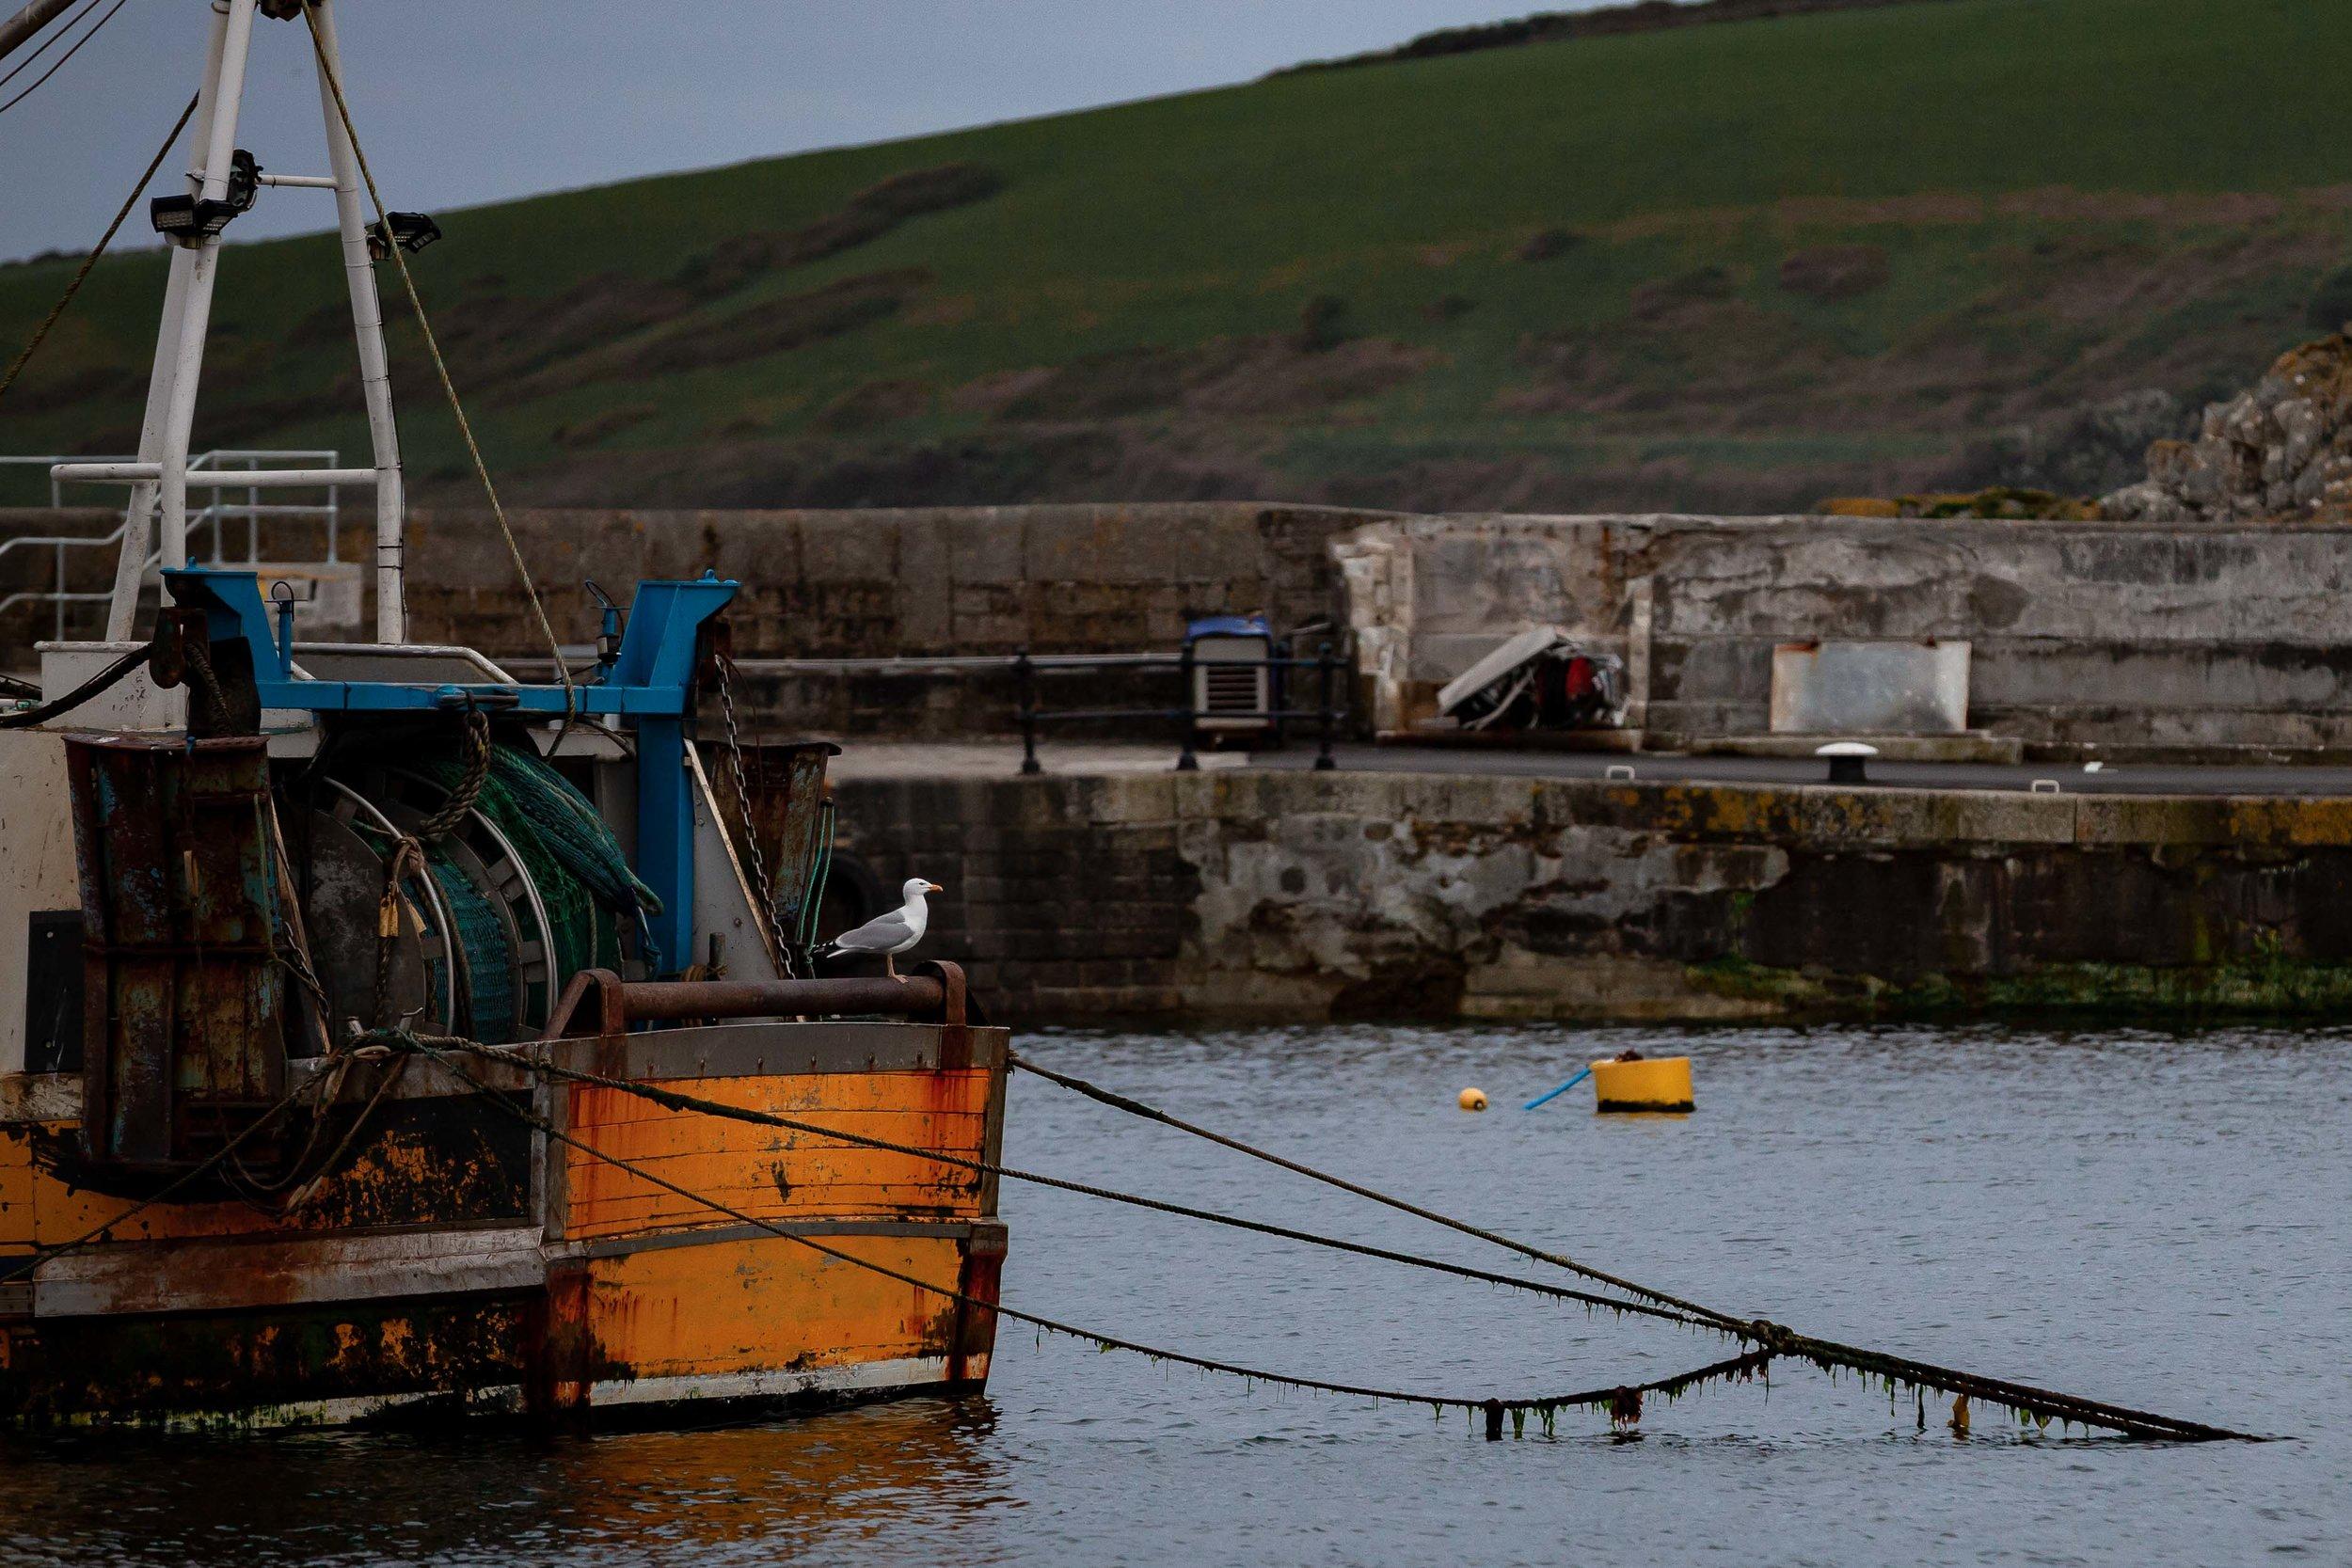 Boat-Builder-Mevagissey-SS-53.jpg